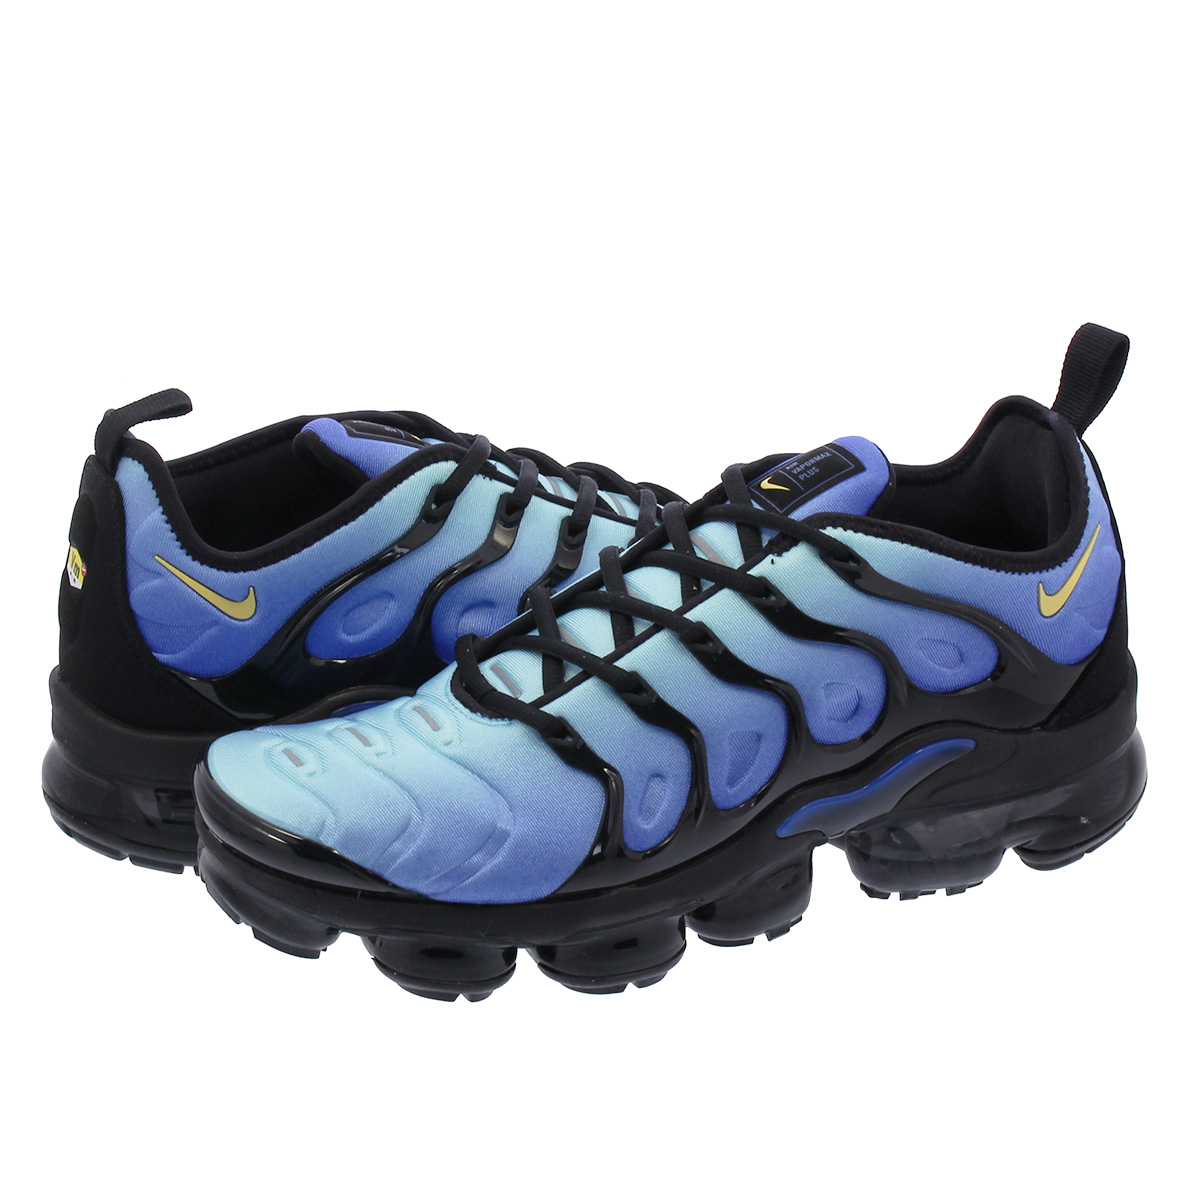 hot sale online ed2ca 4c695 NIKE AIR VAPORMAX PLUS Nike vapor max plus BLACK/CHAMPOIS/HYPER BLUE  924,453-008